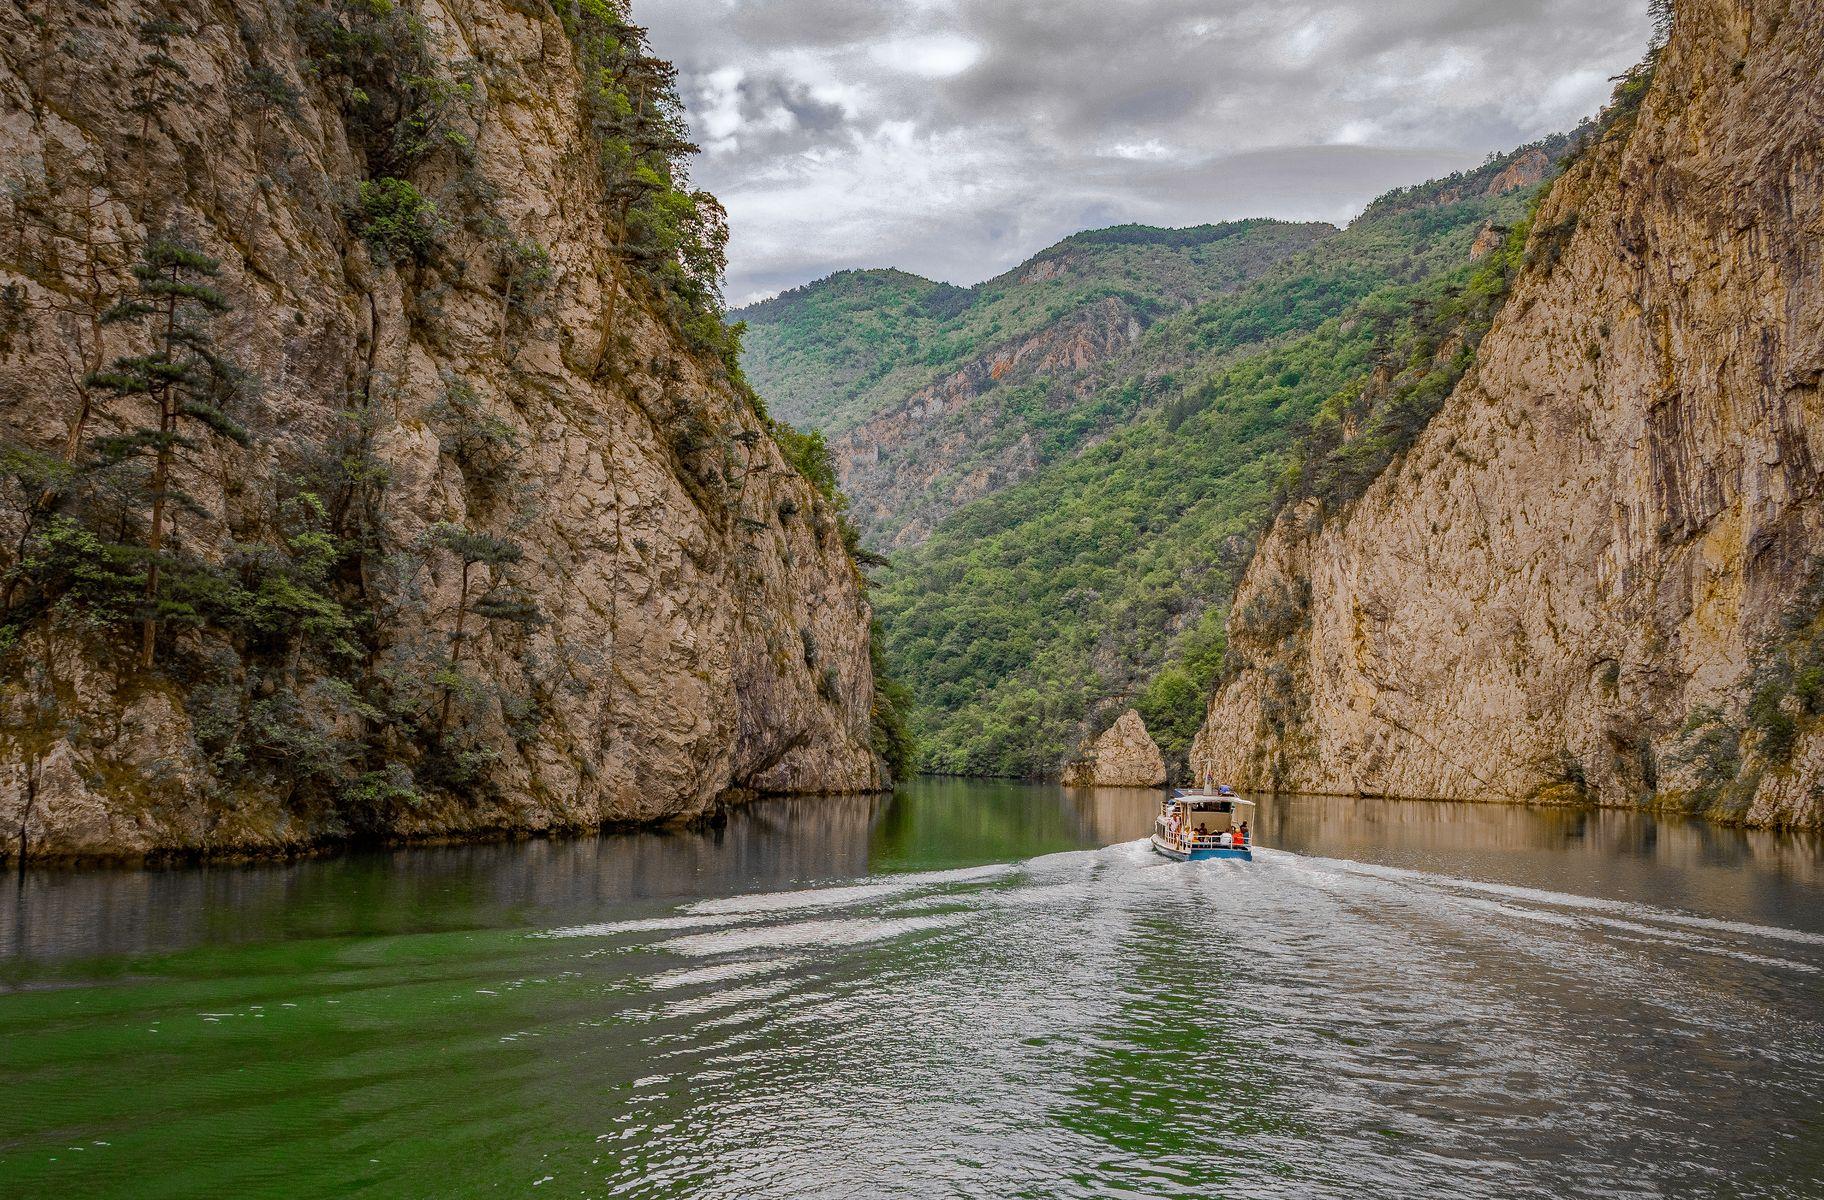 Kanjon Drine (The Drina River Gorge), Marina Stančević